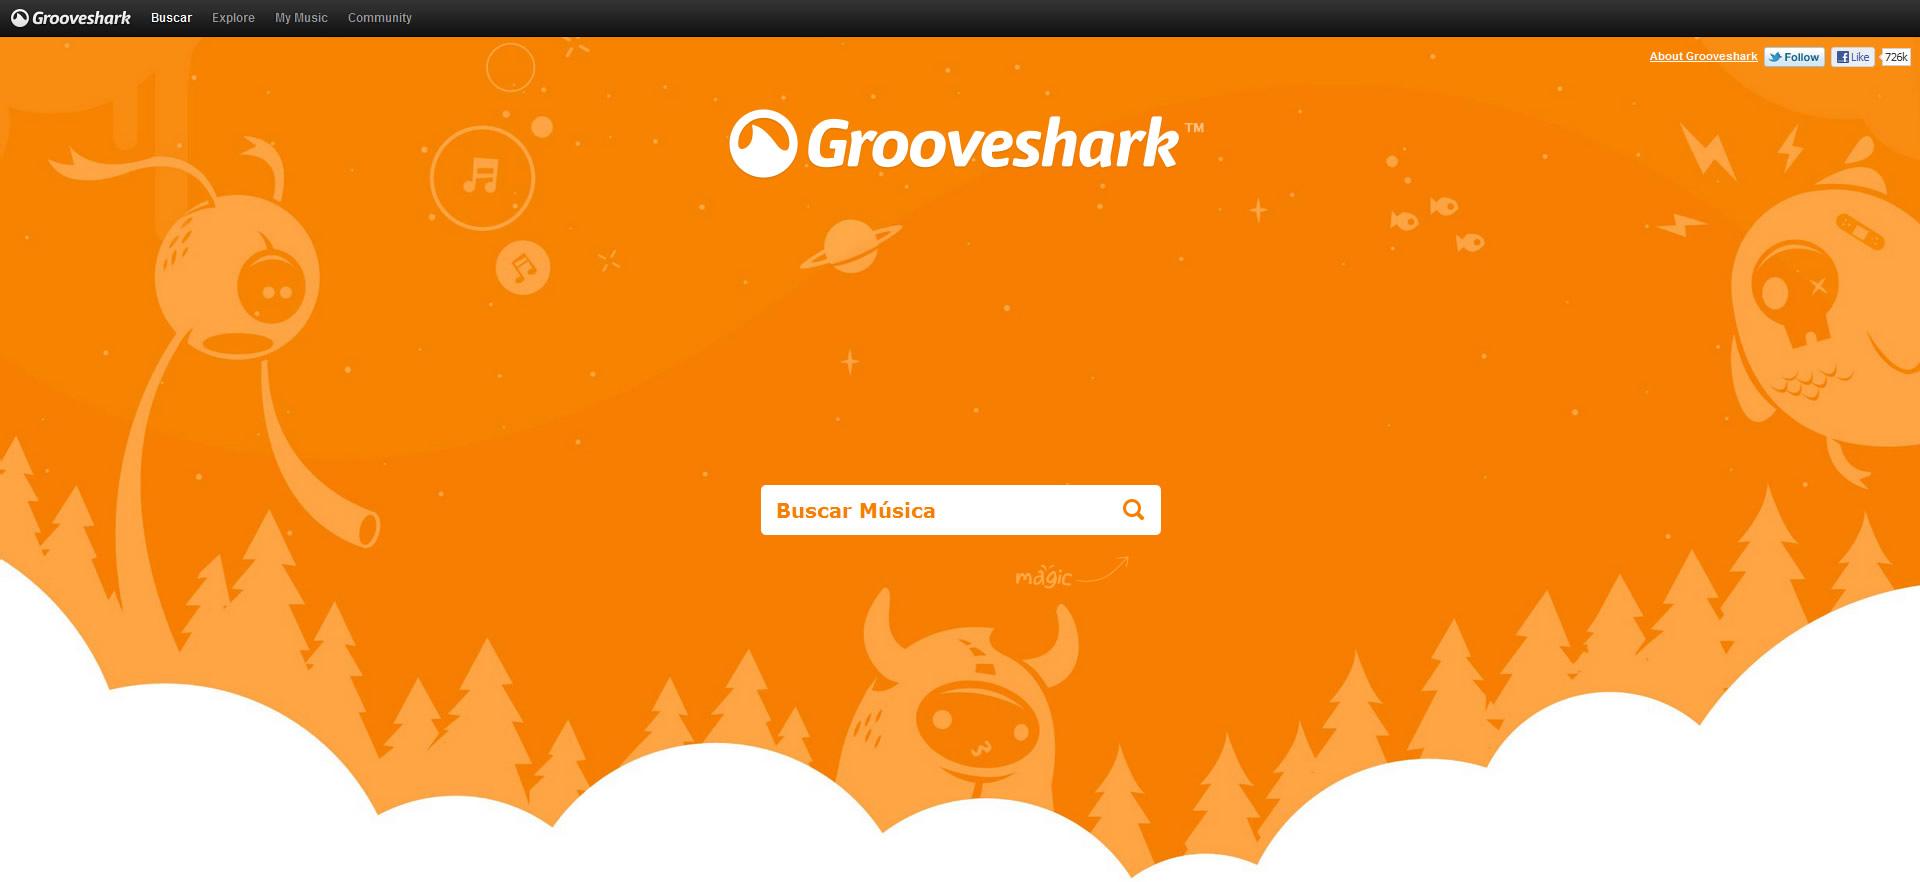 La Interfaz de Grooveshark ya era de excelencia allá por 2011.